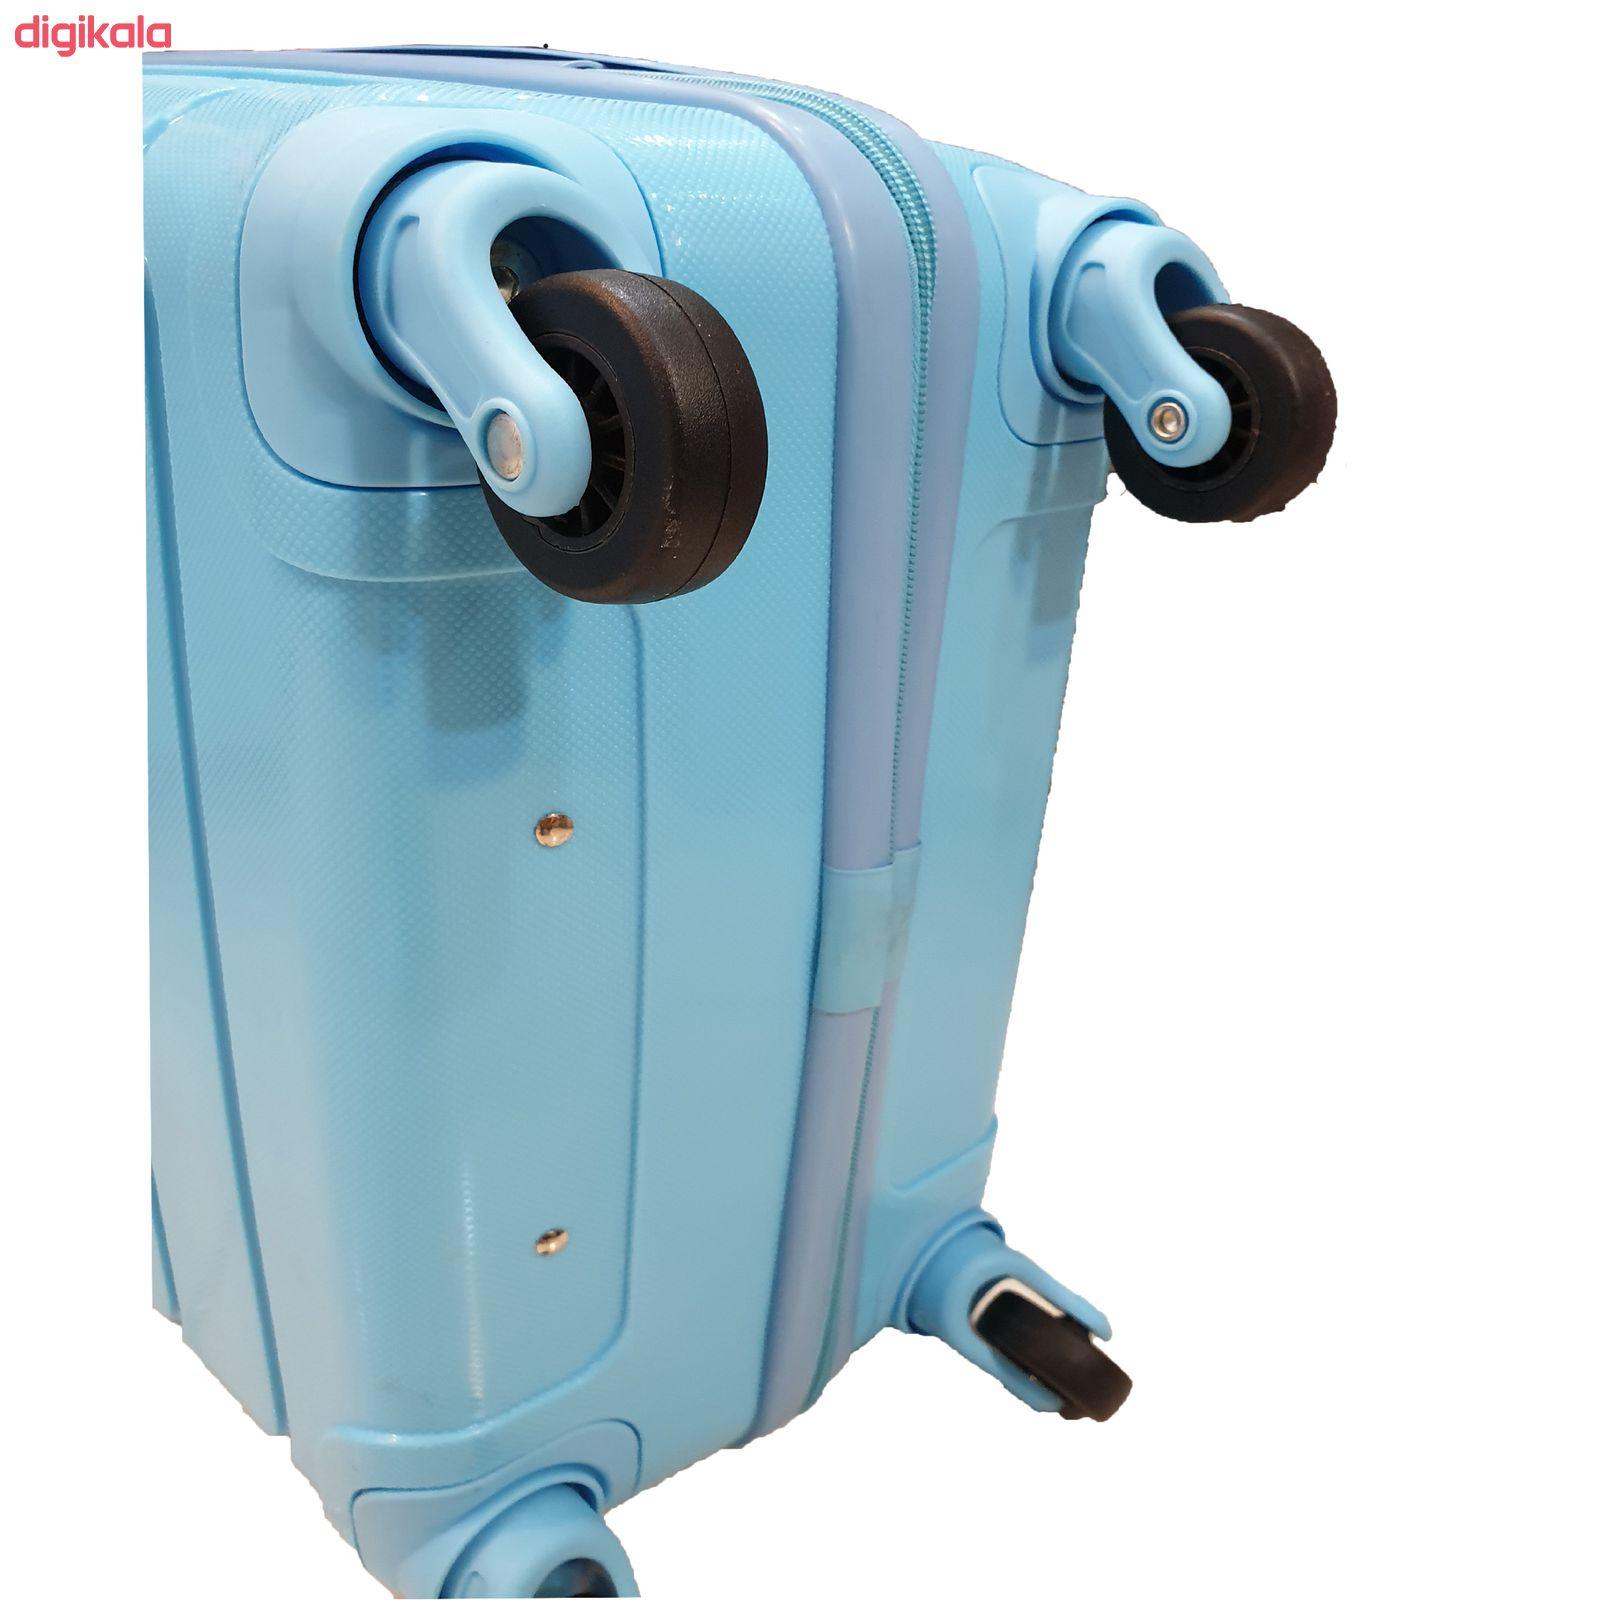 مجموعه سه عددی چمدان اسپید کد B016 main 1 2